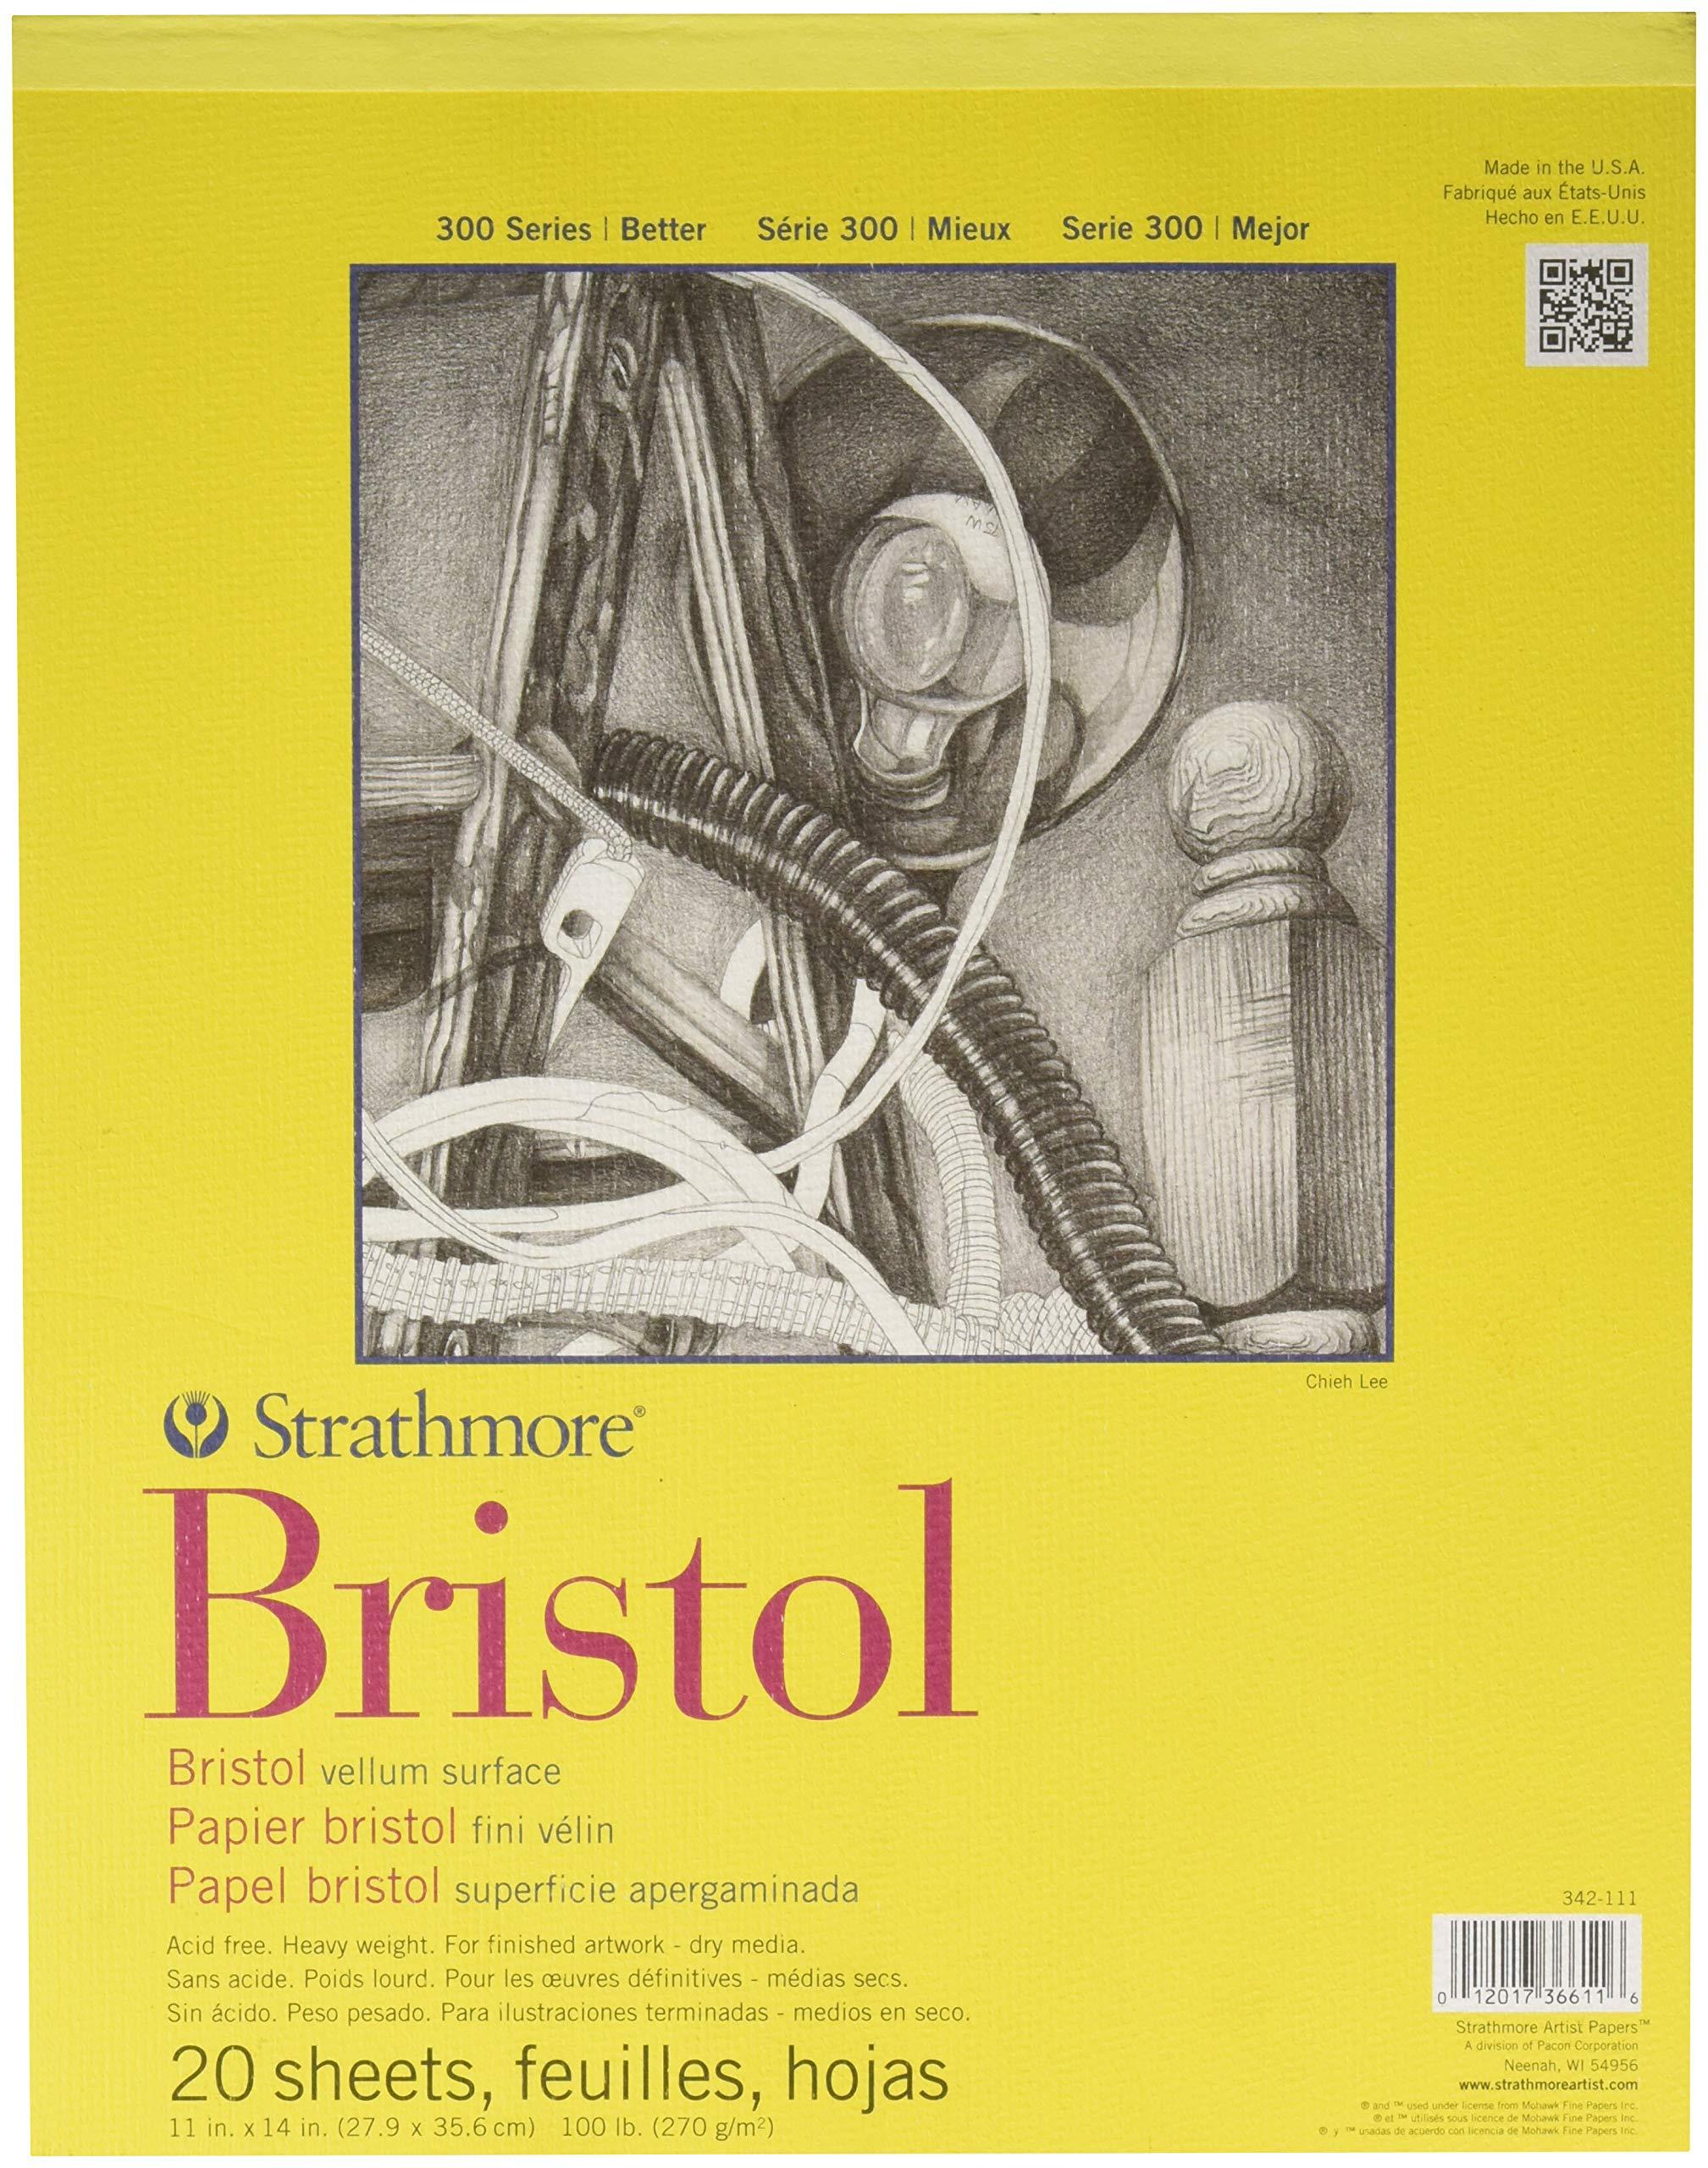 Strathmore 300 Series Bristol Pad - 11-Inchx14-Inch - 20 Sheet Pad by Strathmore